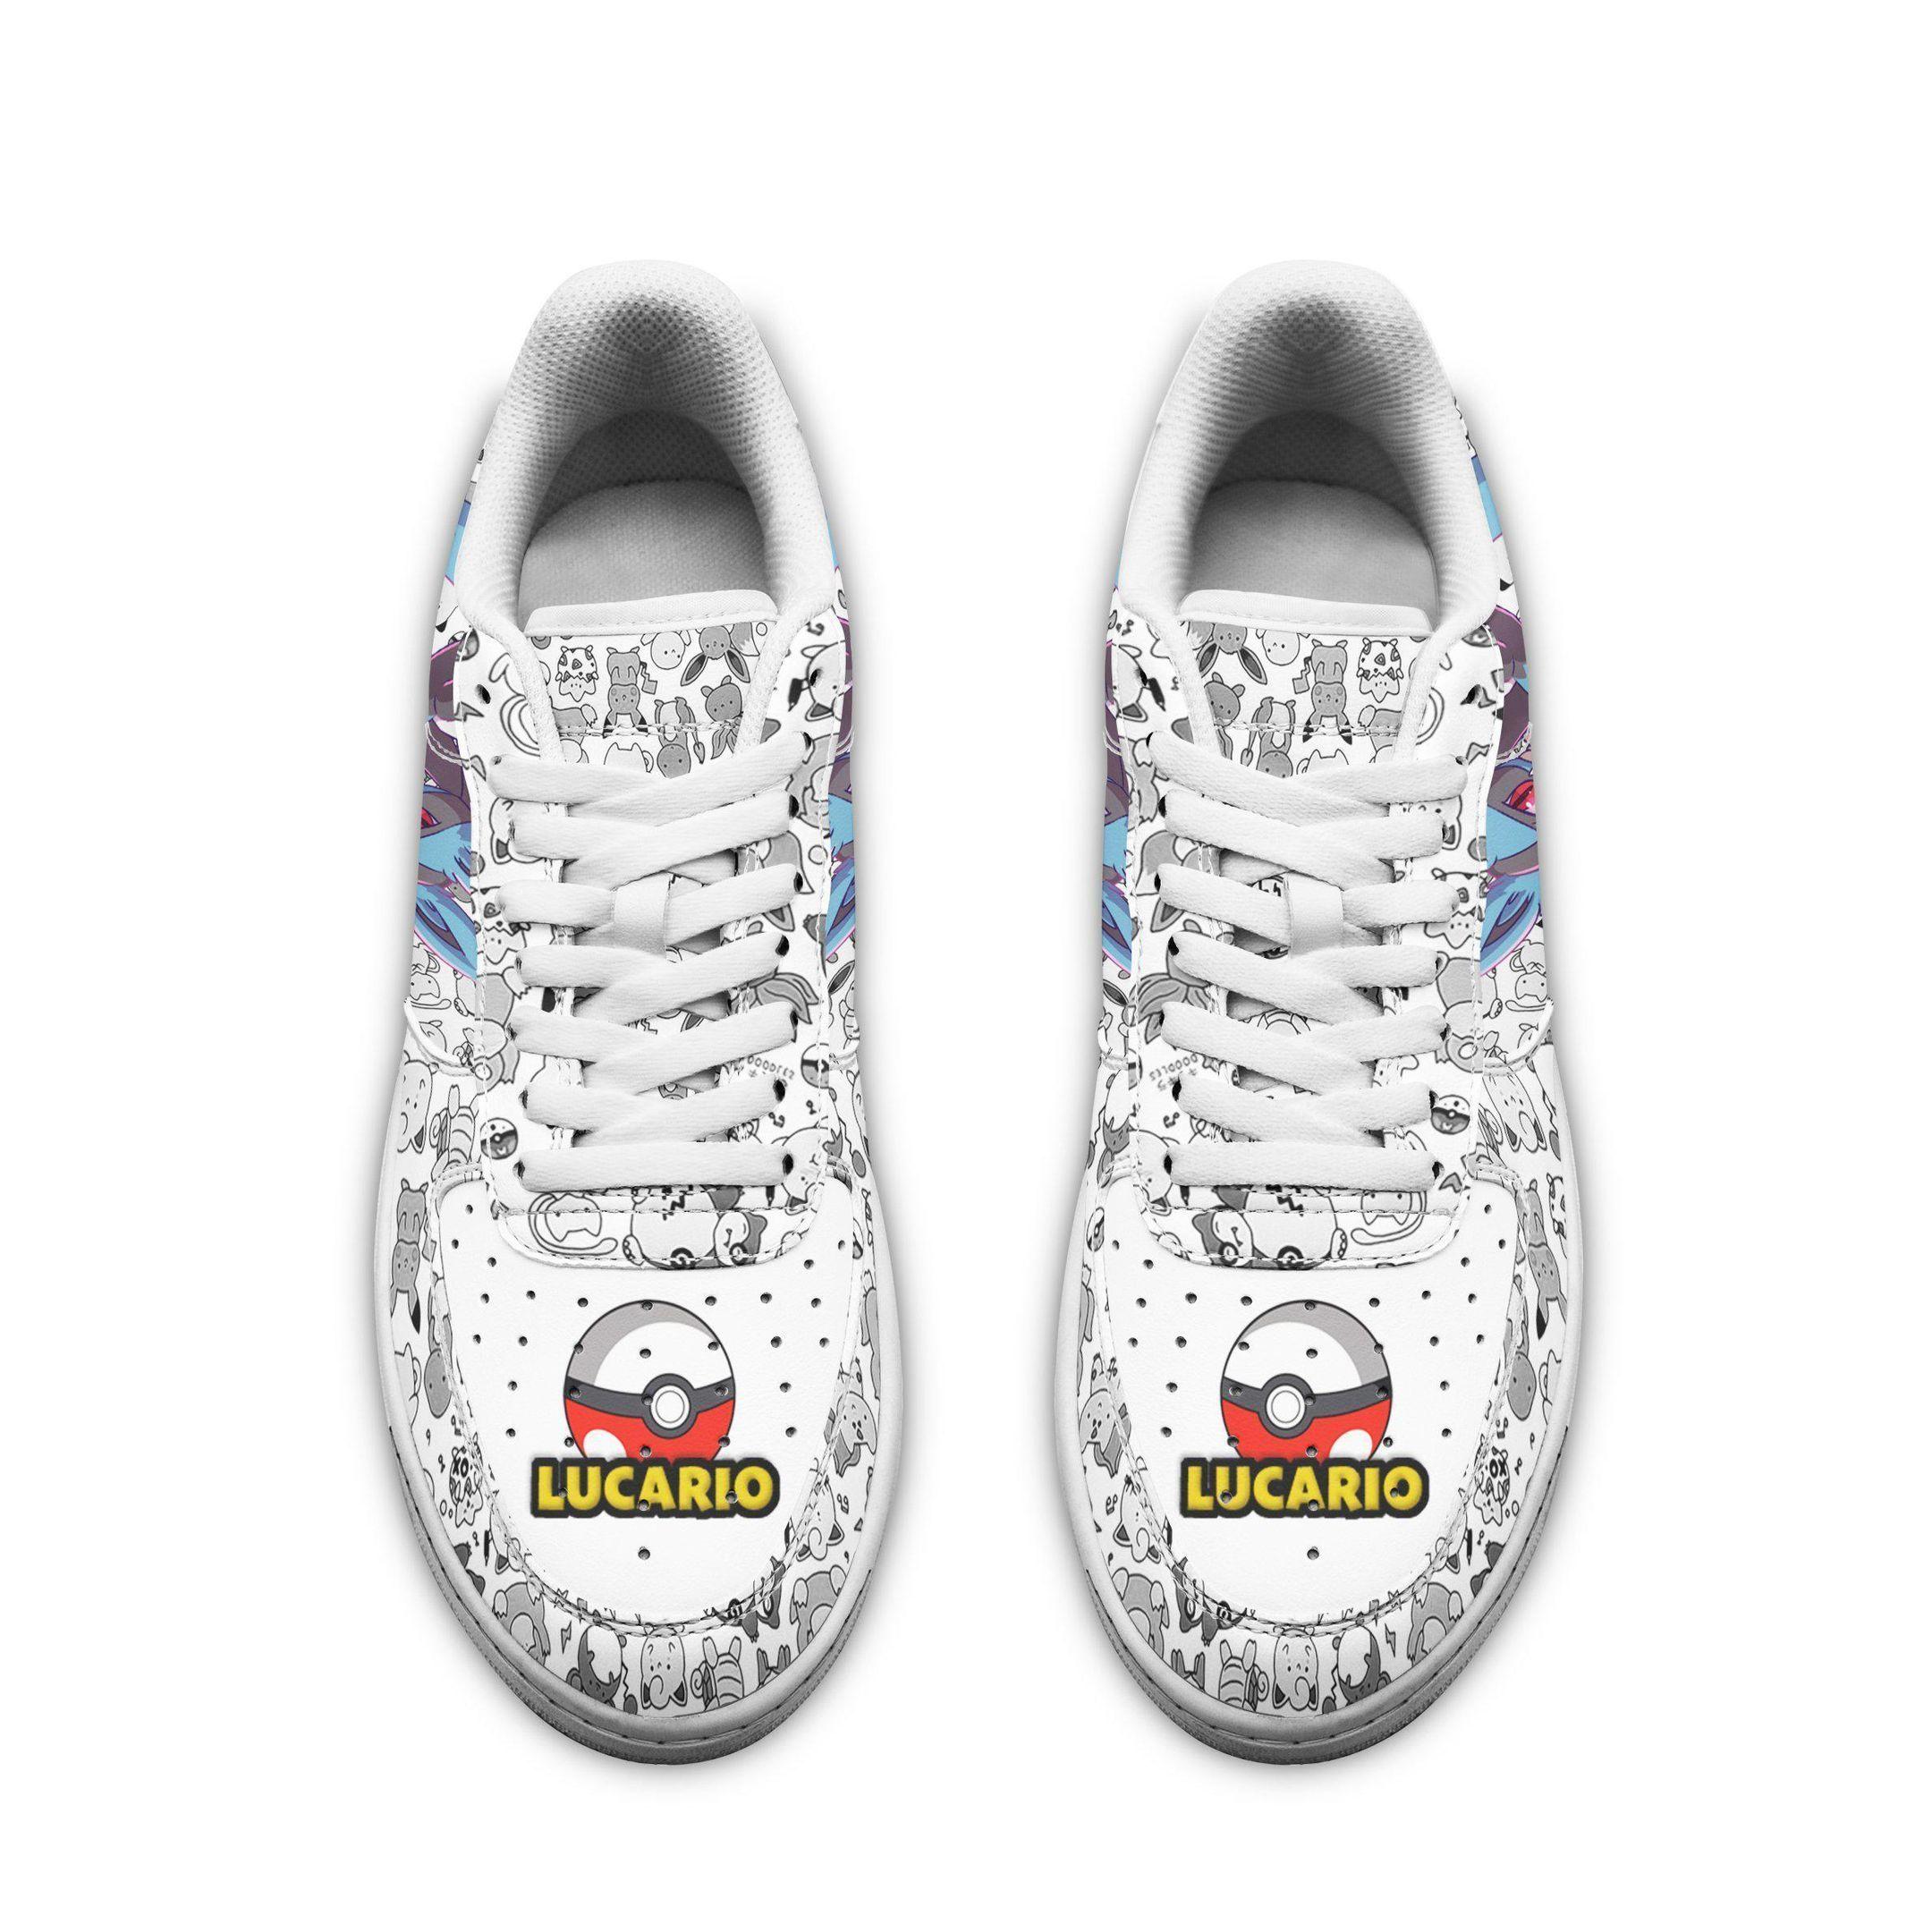 Lucario Air Shoes Pokemon Shoes Fan Gift Idea GO1012